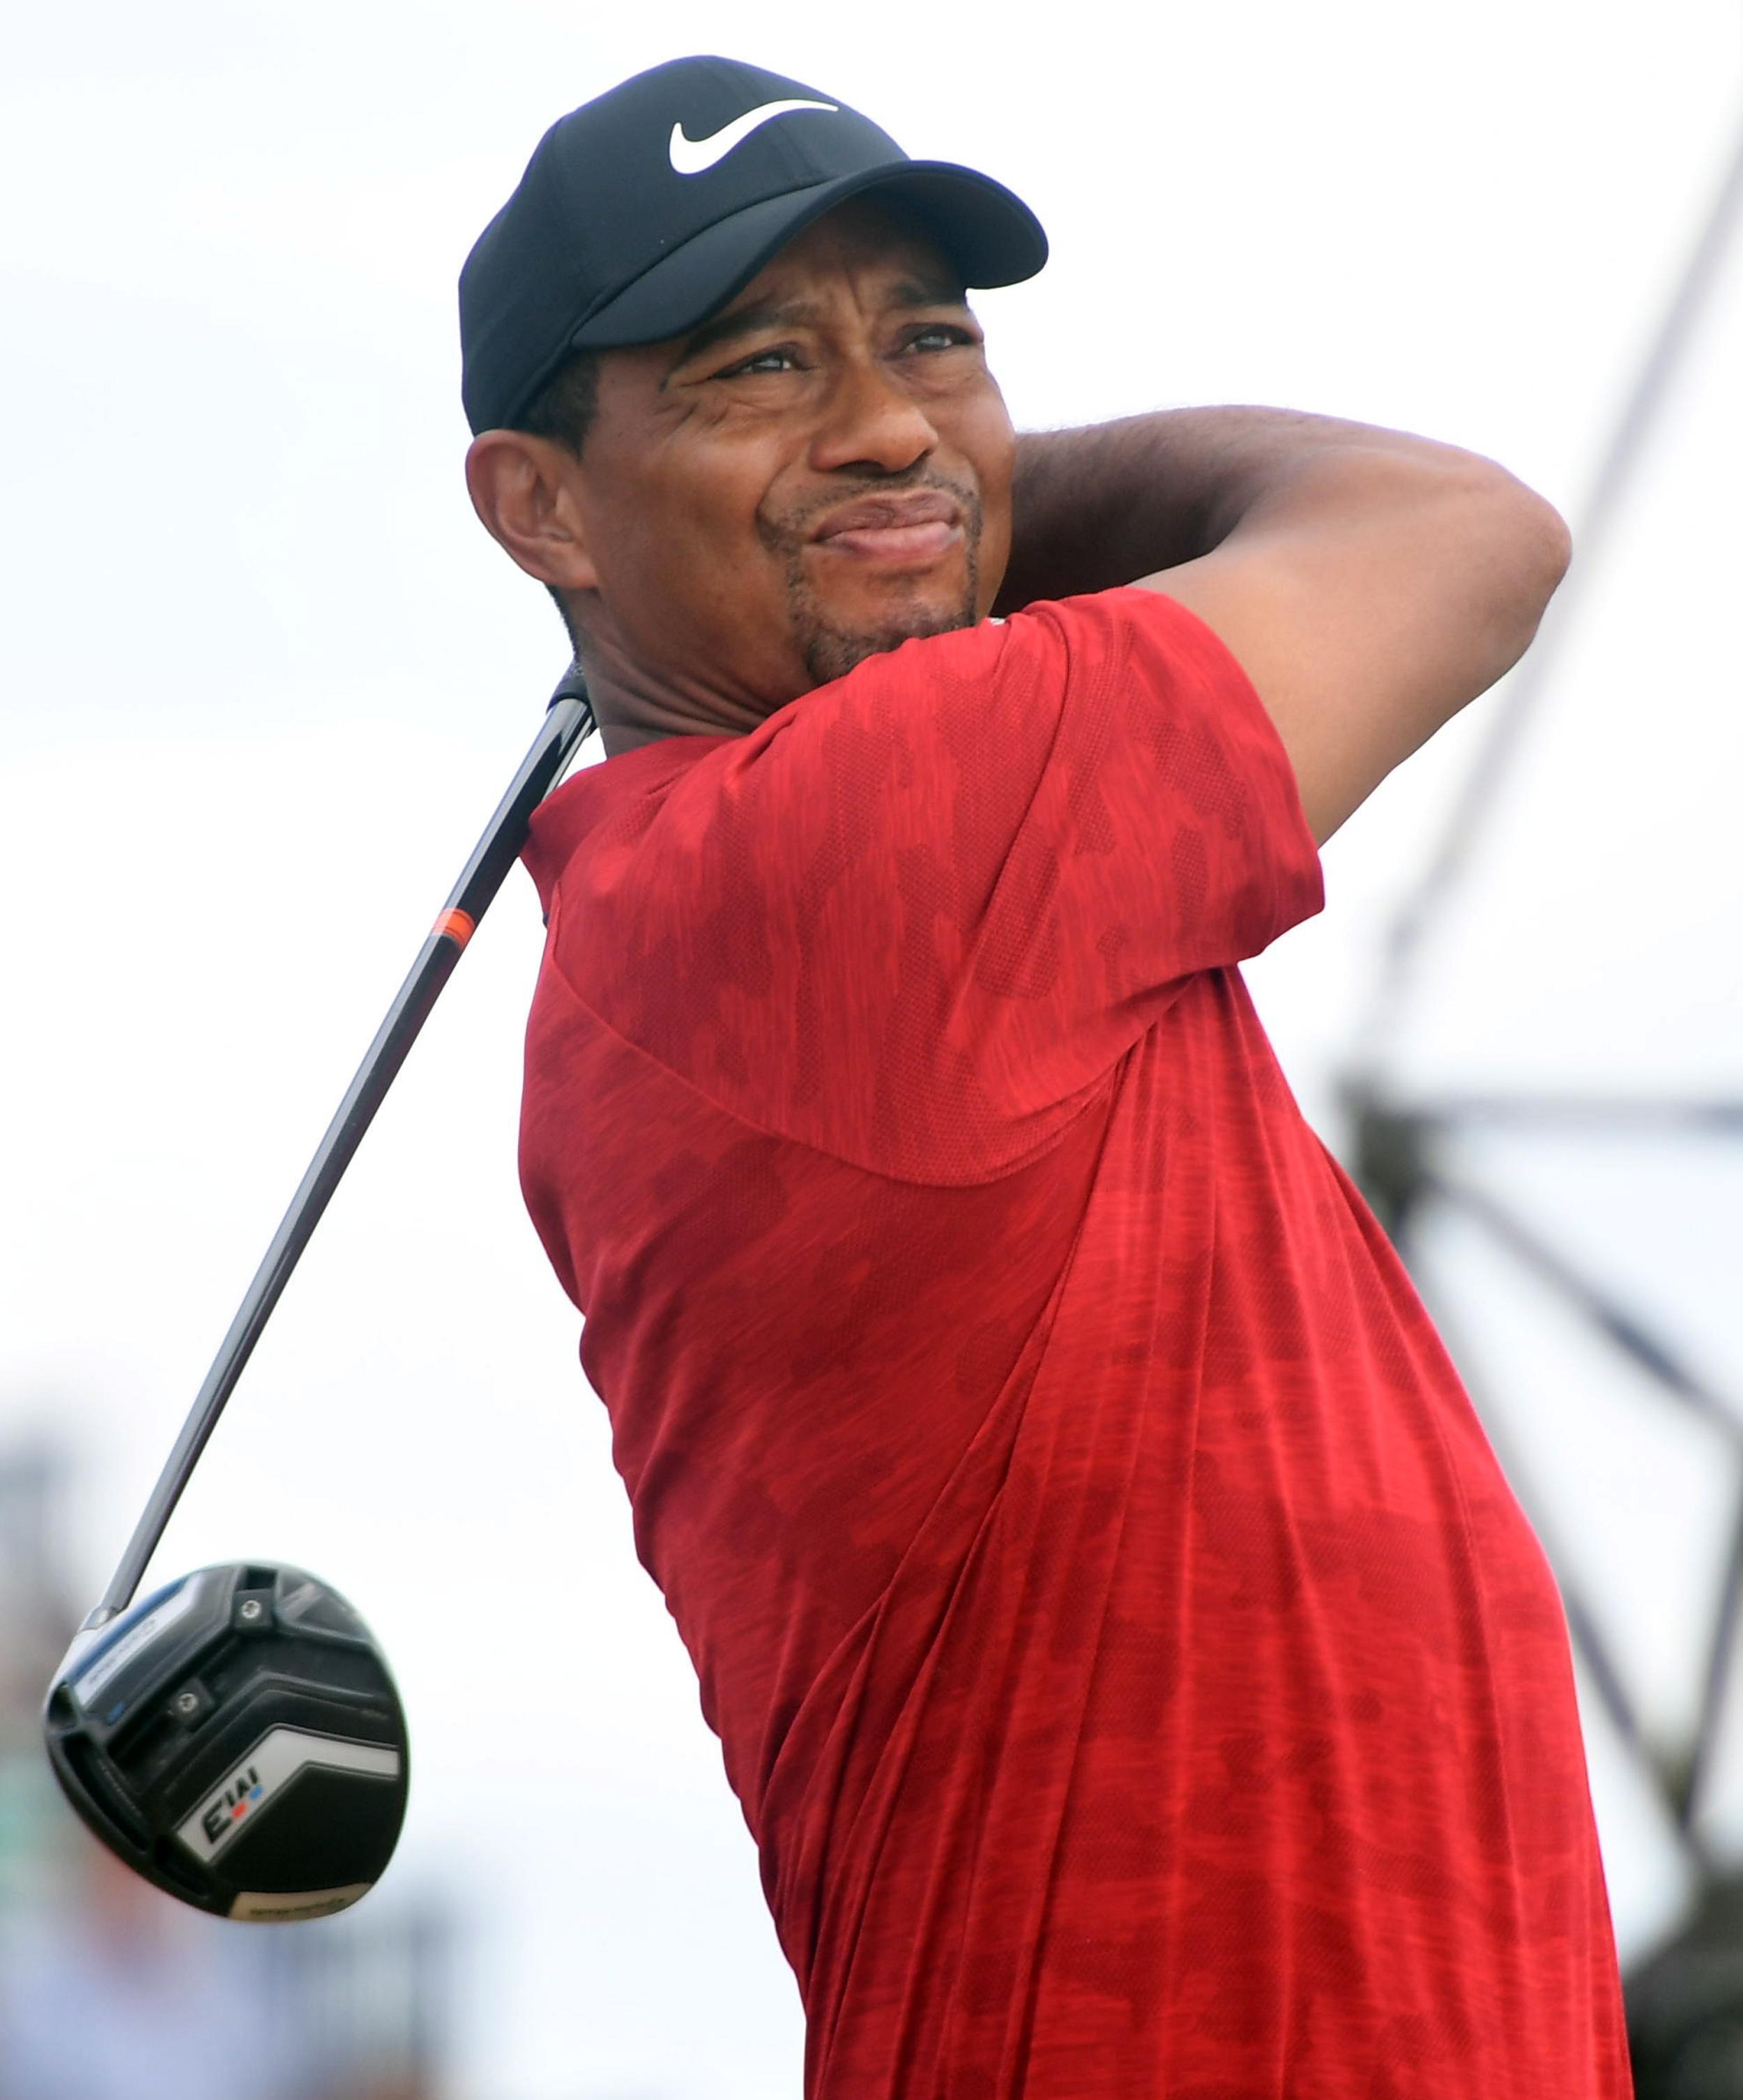 Tiger Woods finished three shots behind eventual champion Francesco Molinari